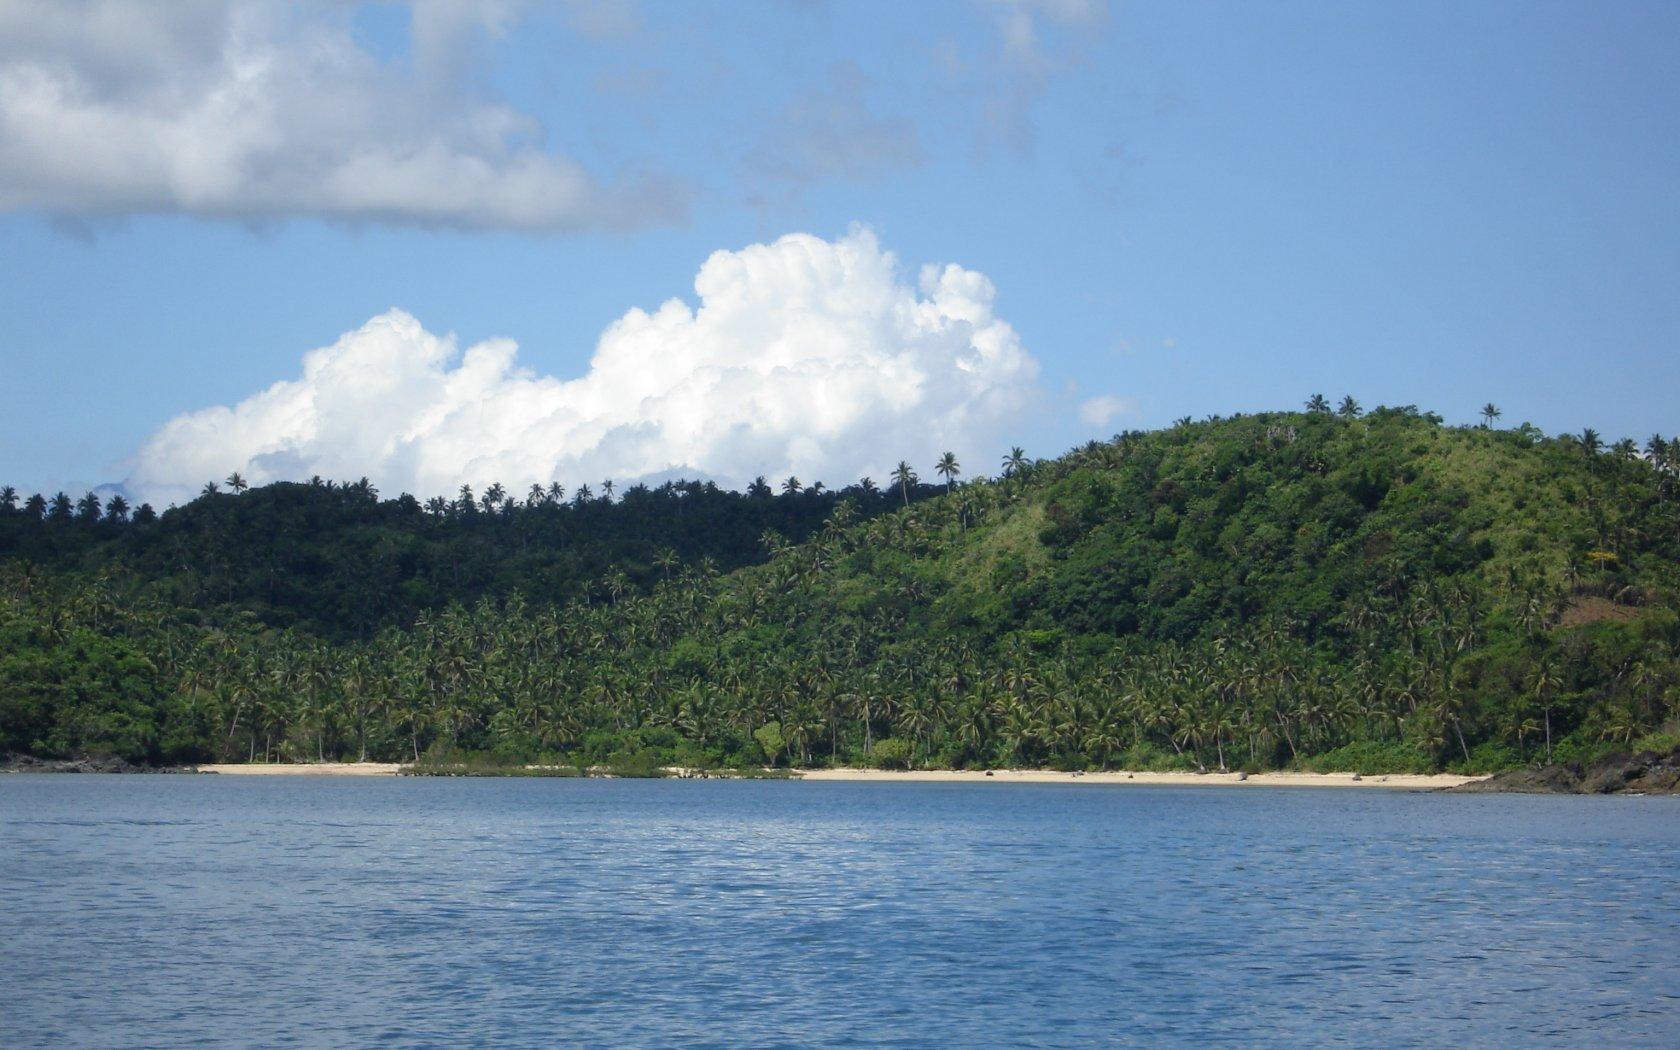 Most Beautiful Widescreen Desktop Wallpaper Collection: Beach Wallpapers: Philippines Most Beautiful Beaches